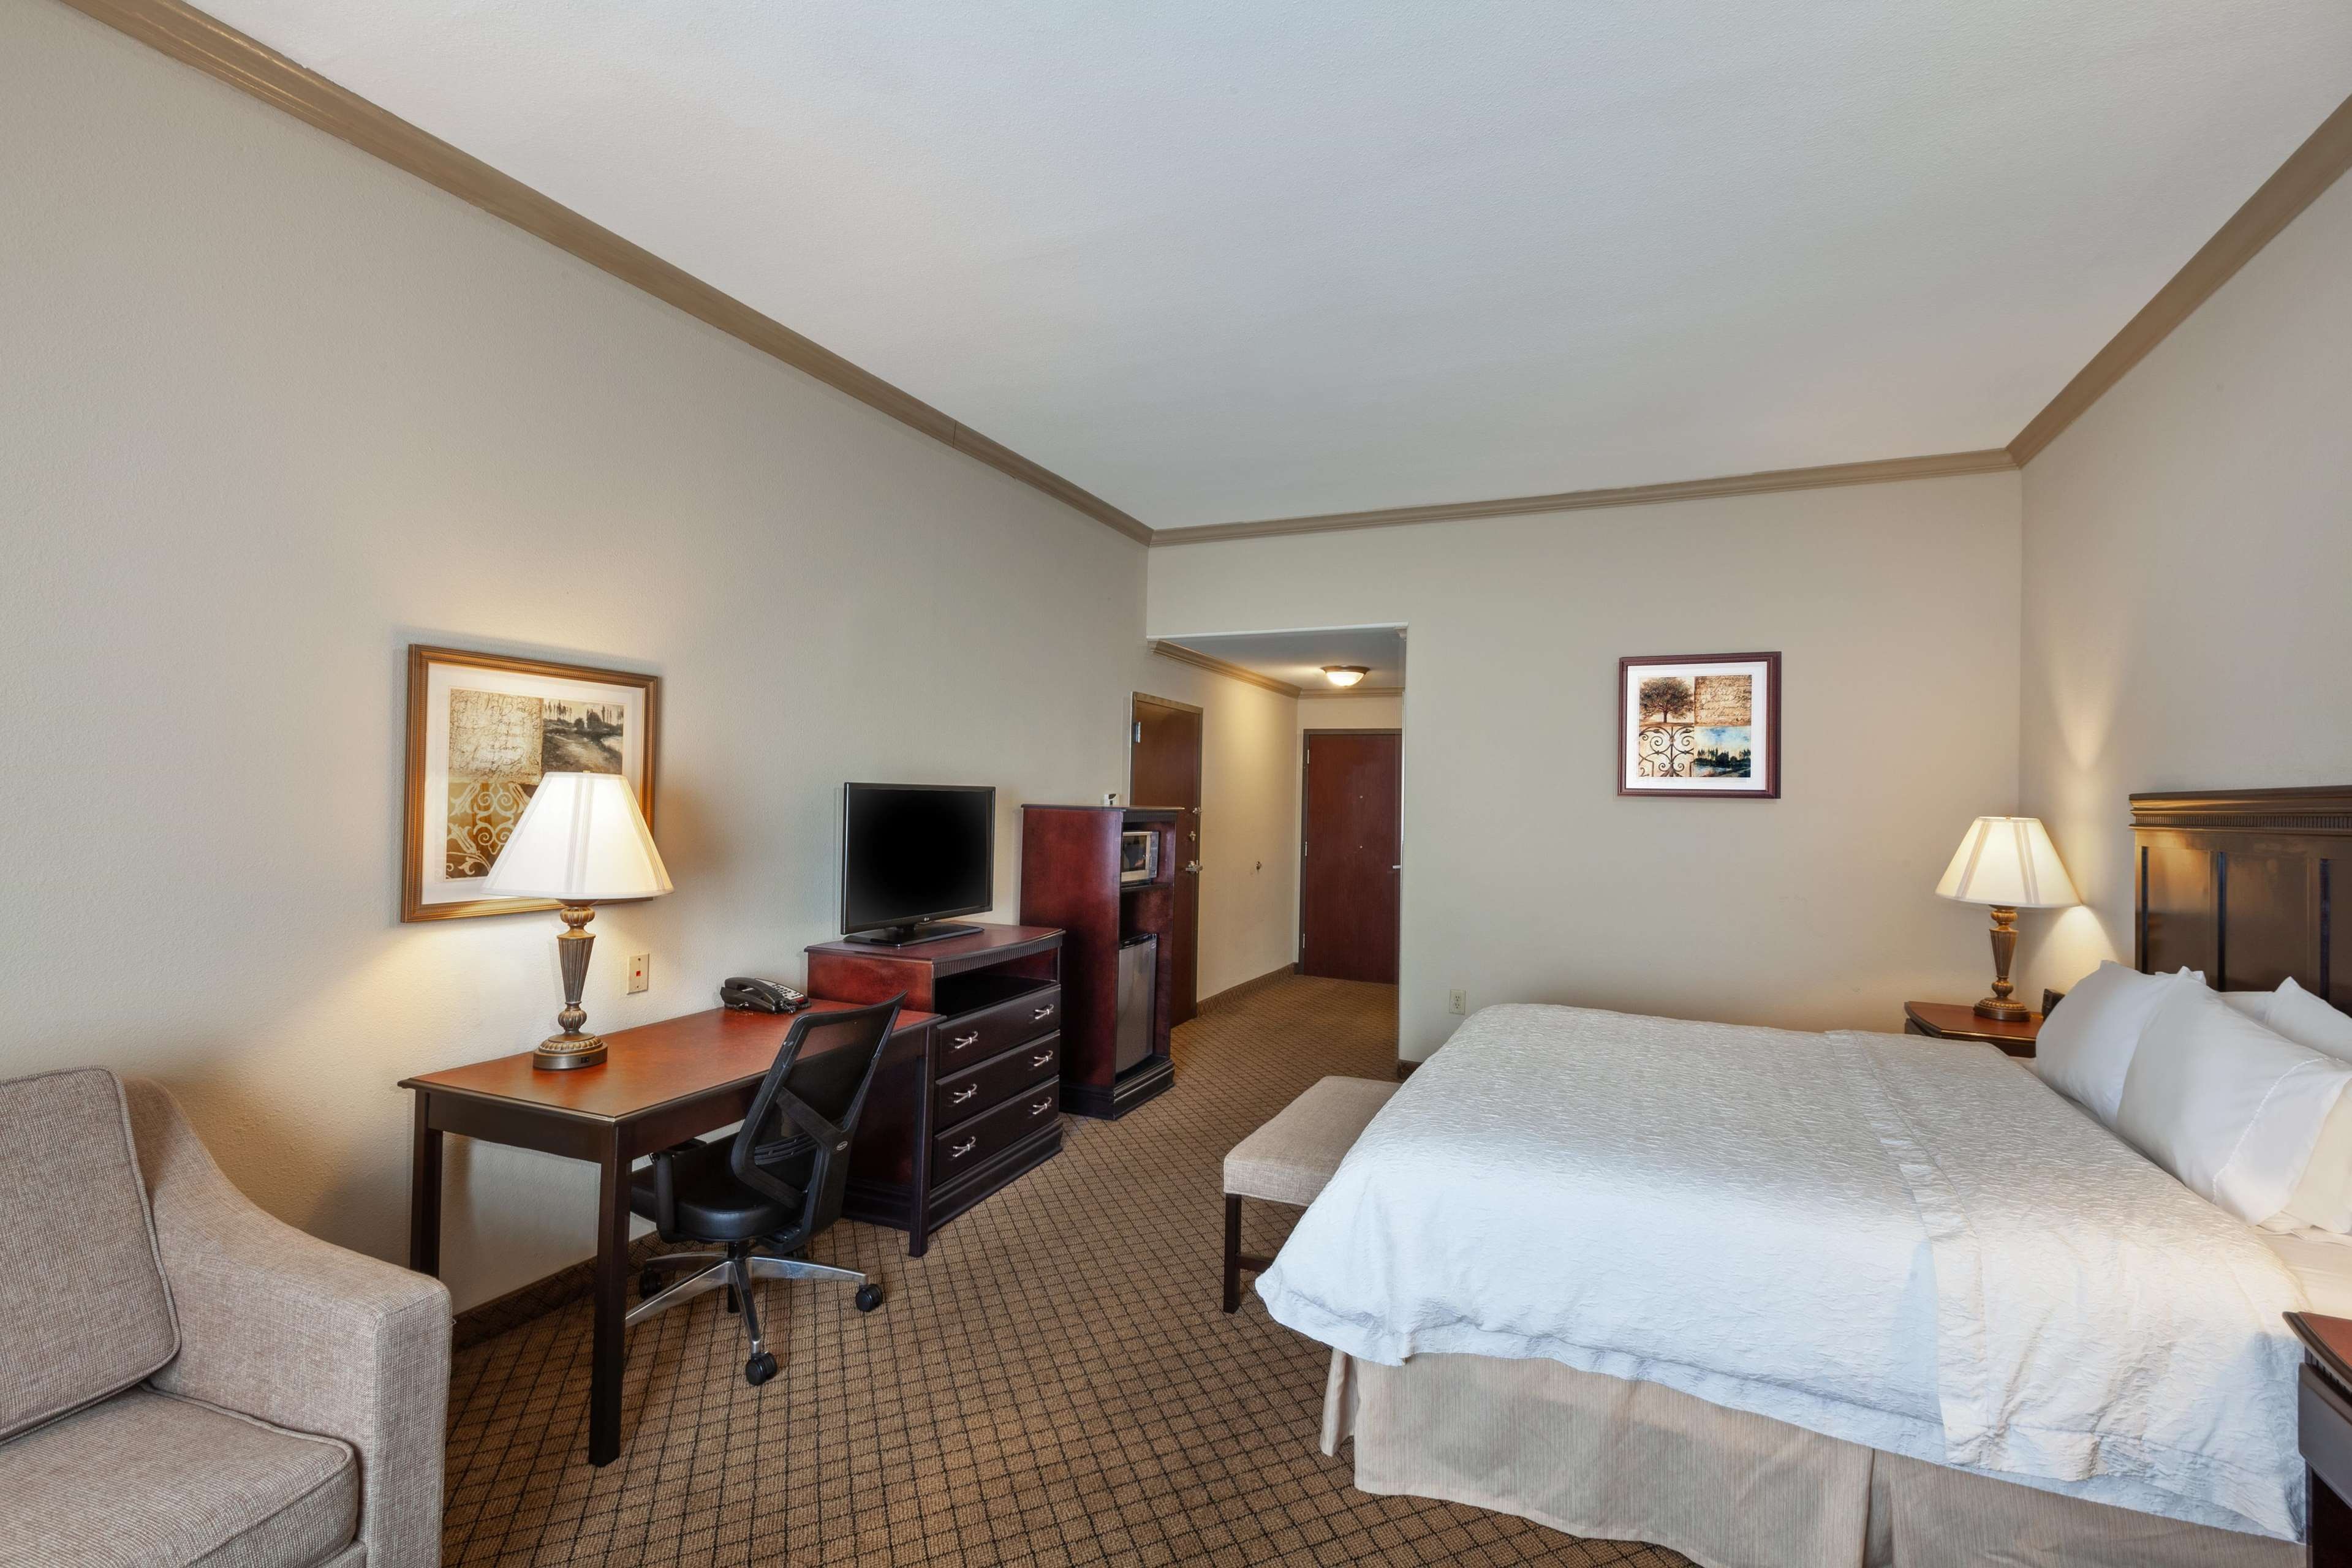 Hampton Inn & Suites Galveston image 26